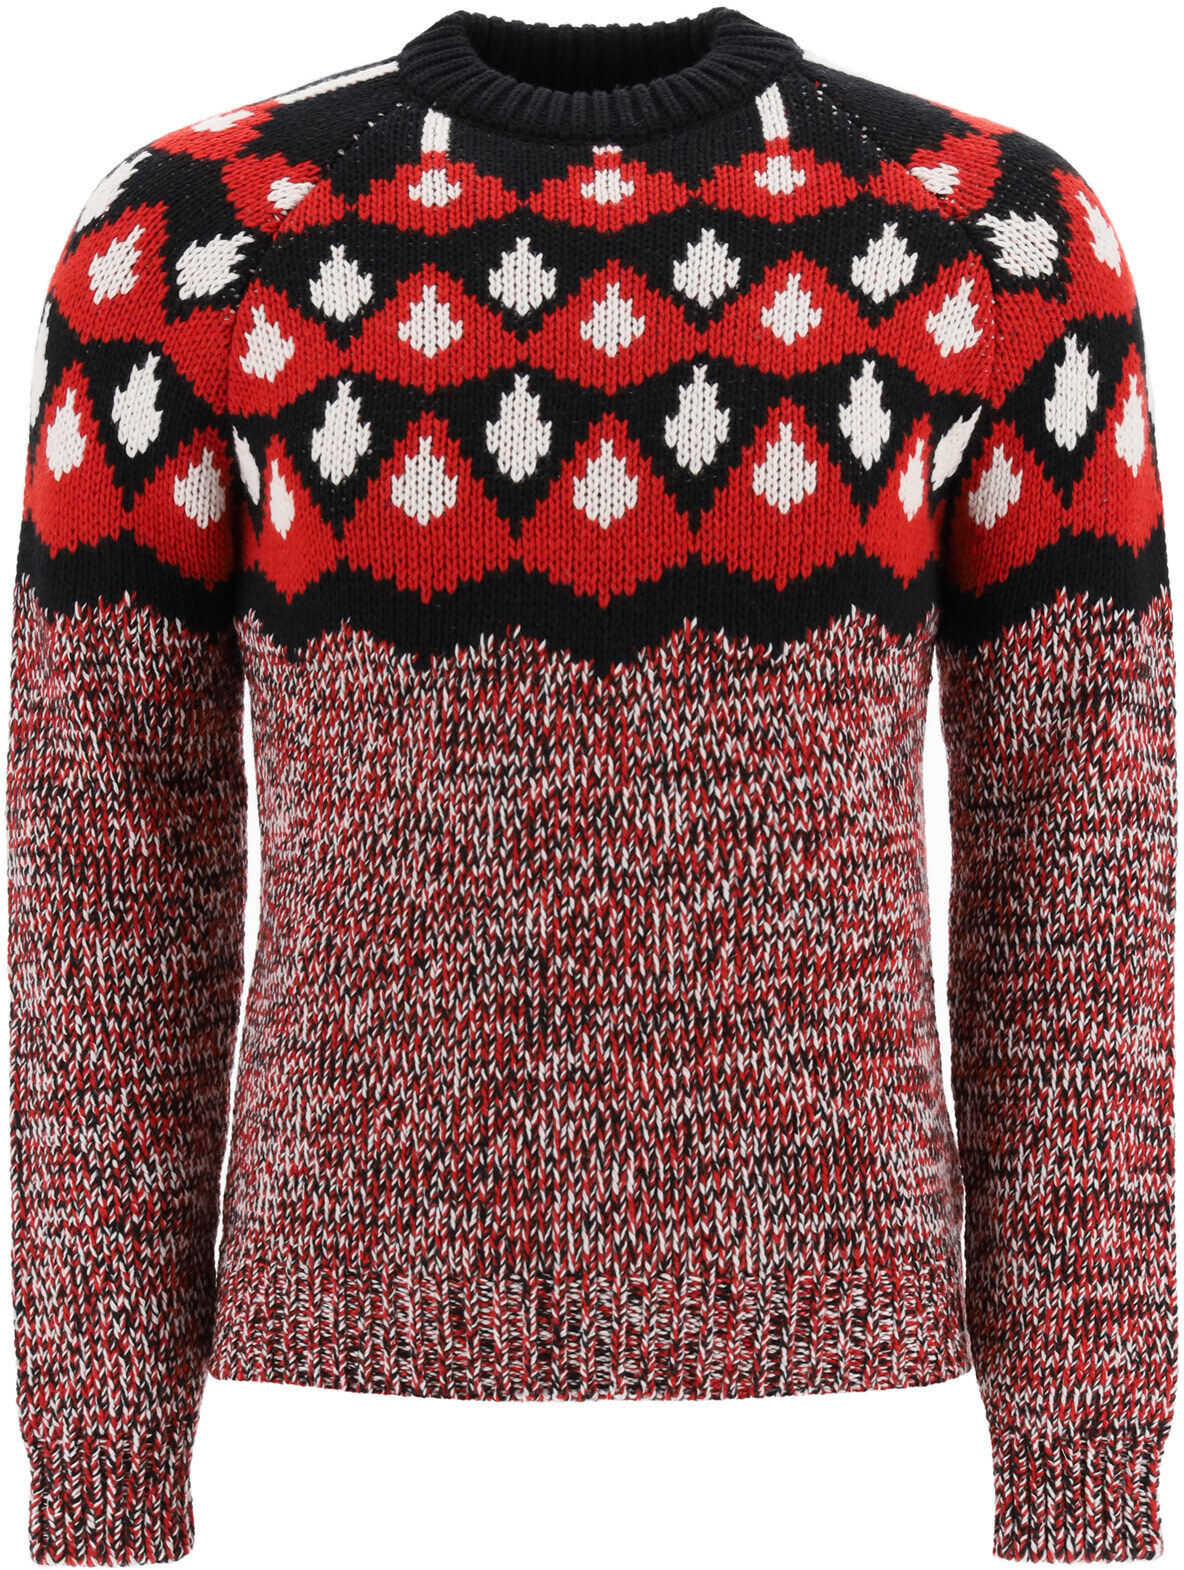 Prada Jacquard Sweater F3 NERO ROSSO imagine